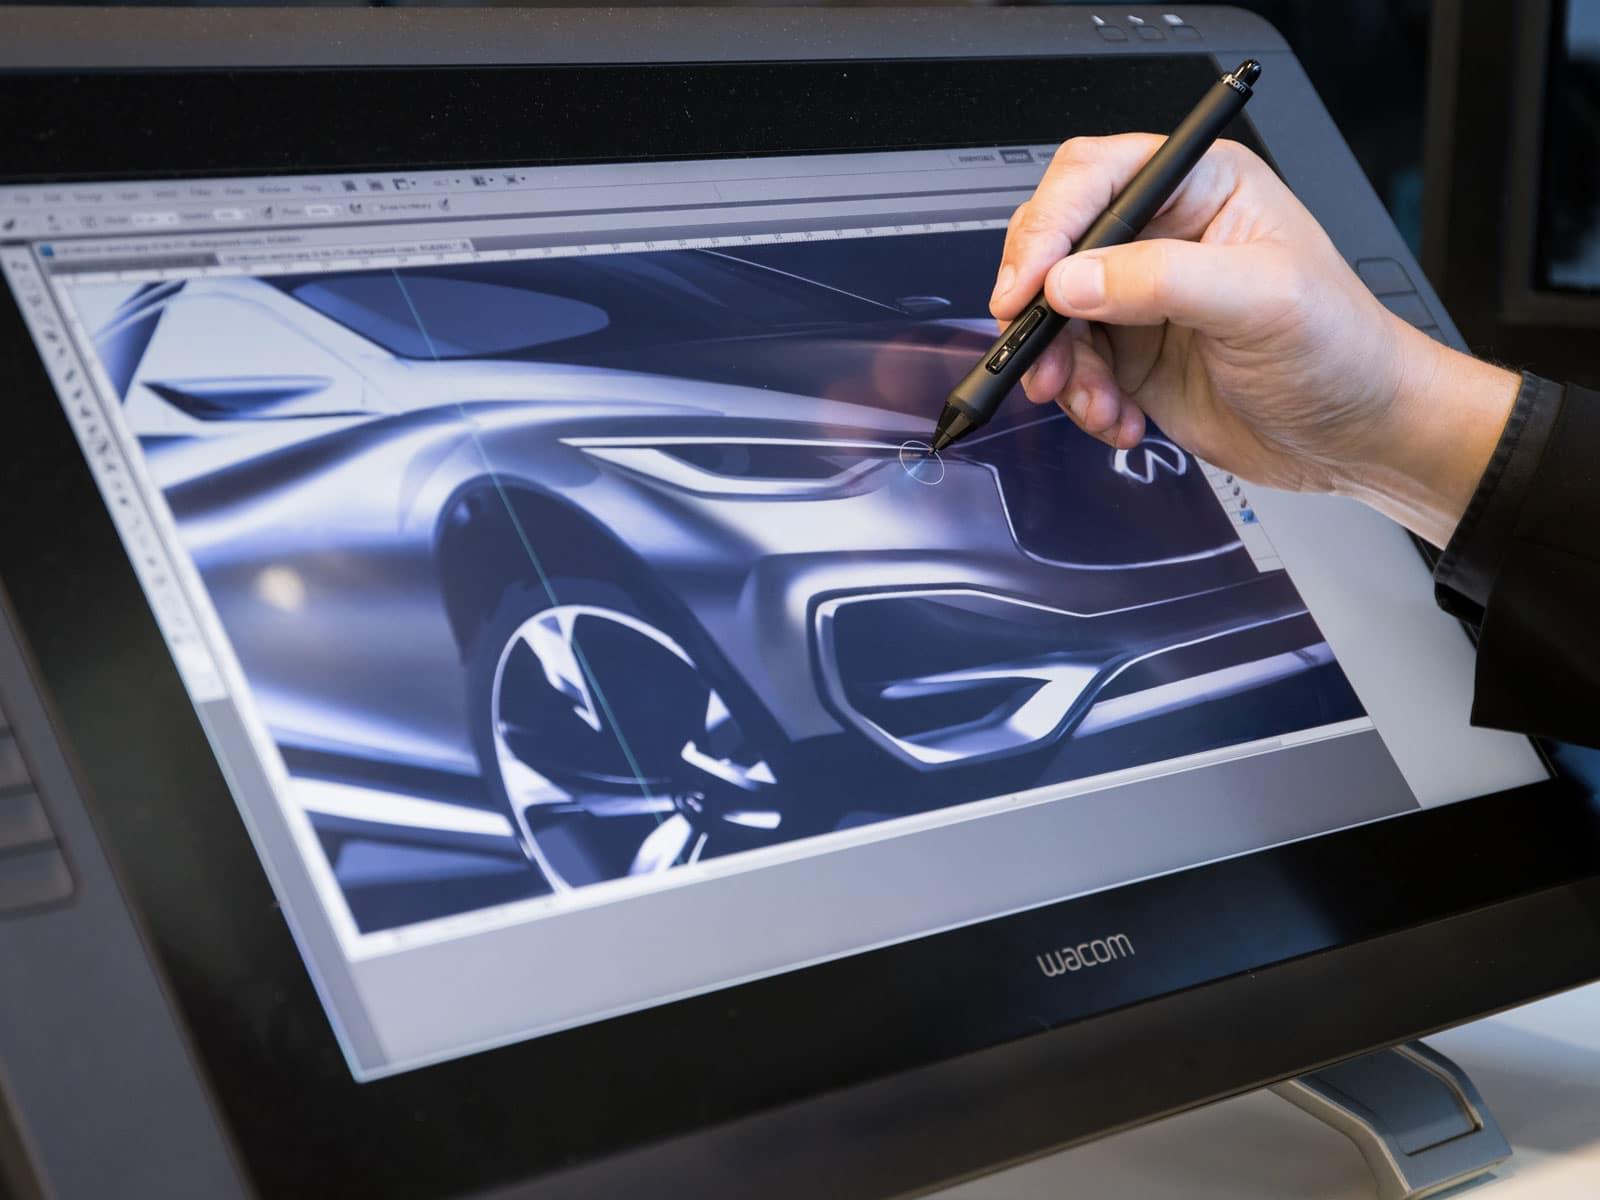 Man designing model of car on Wacom tablet in Gravity Sketch